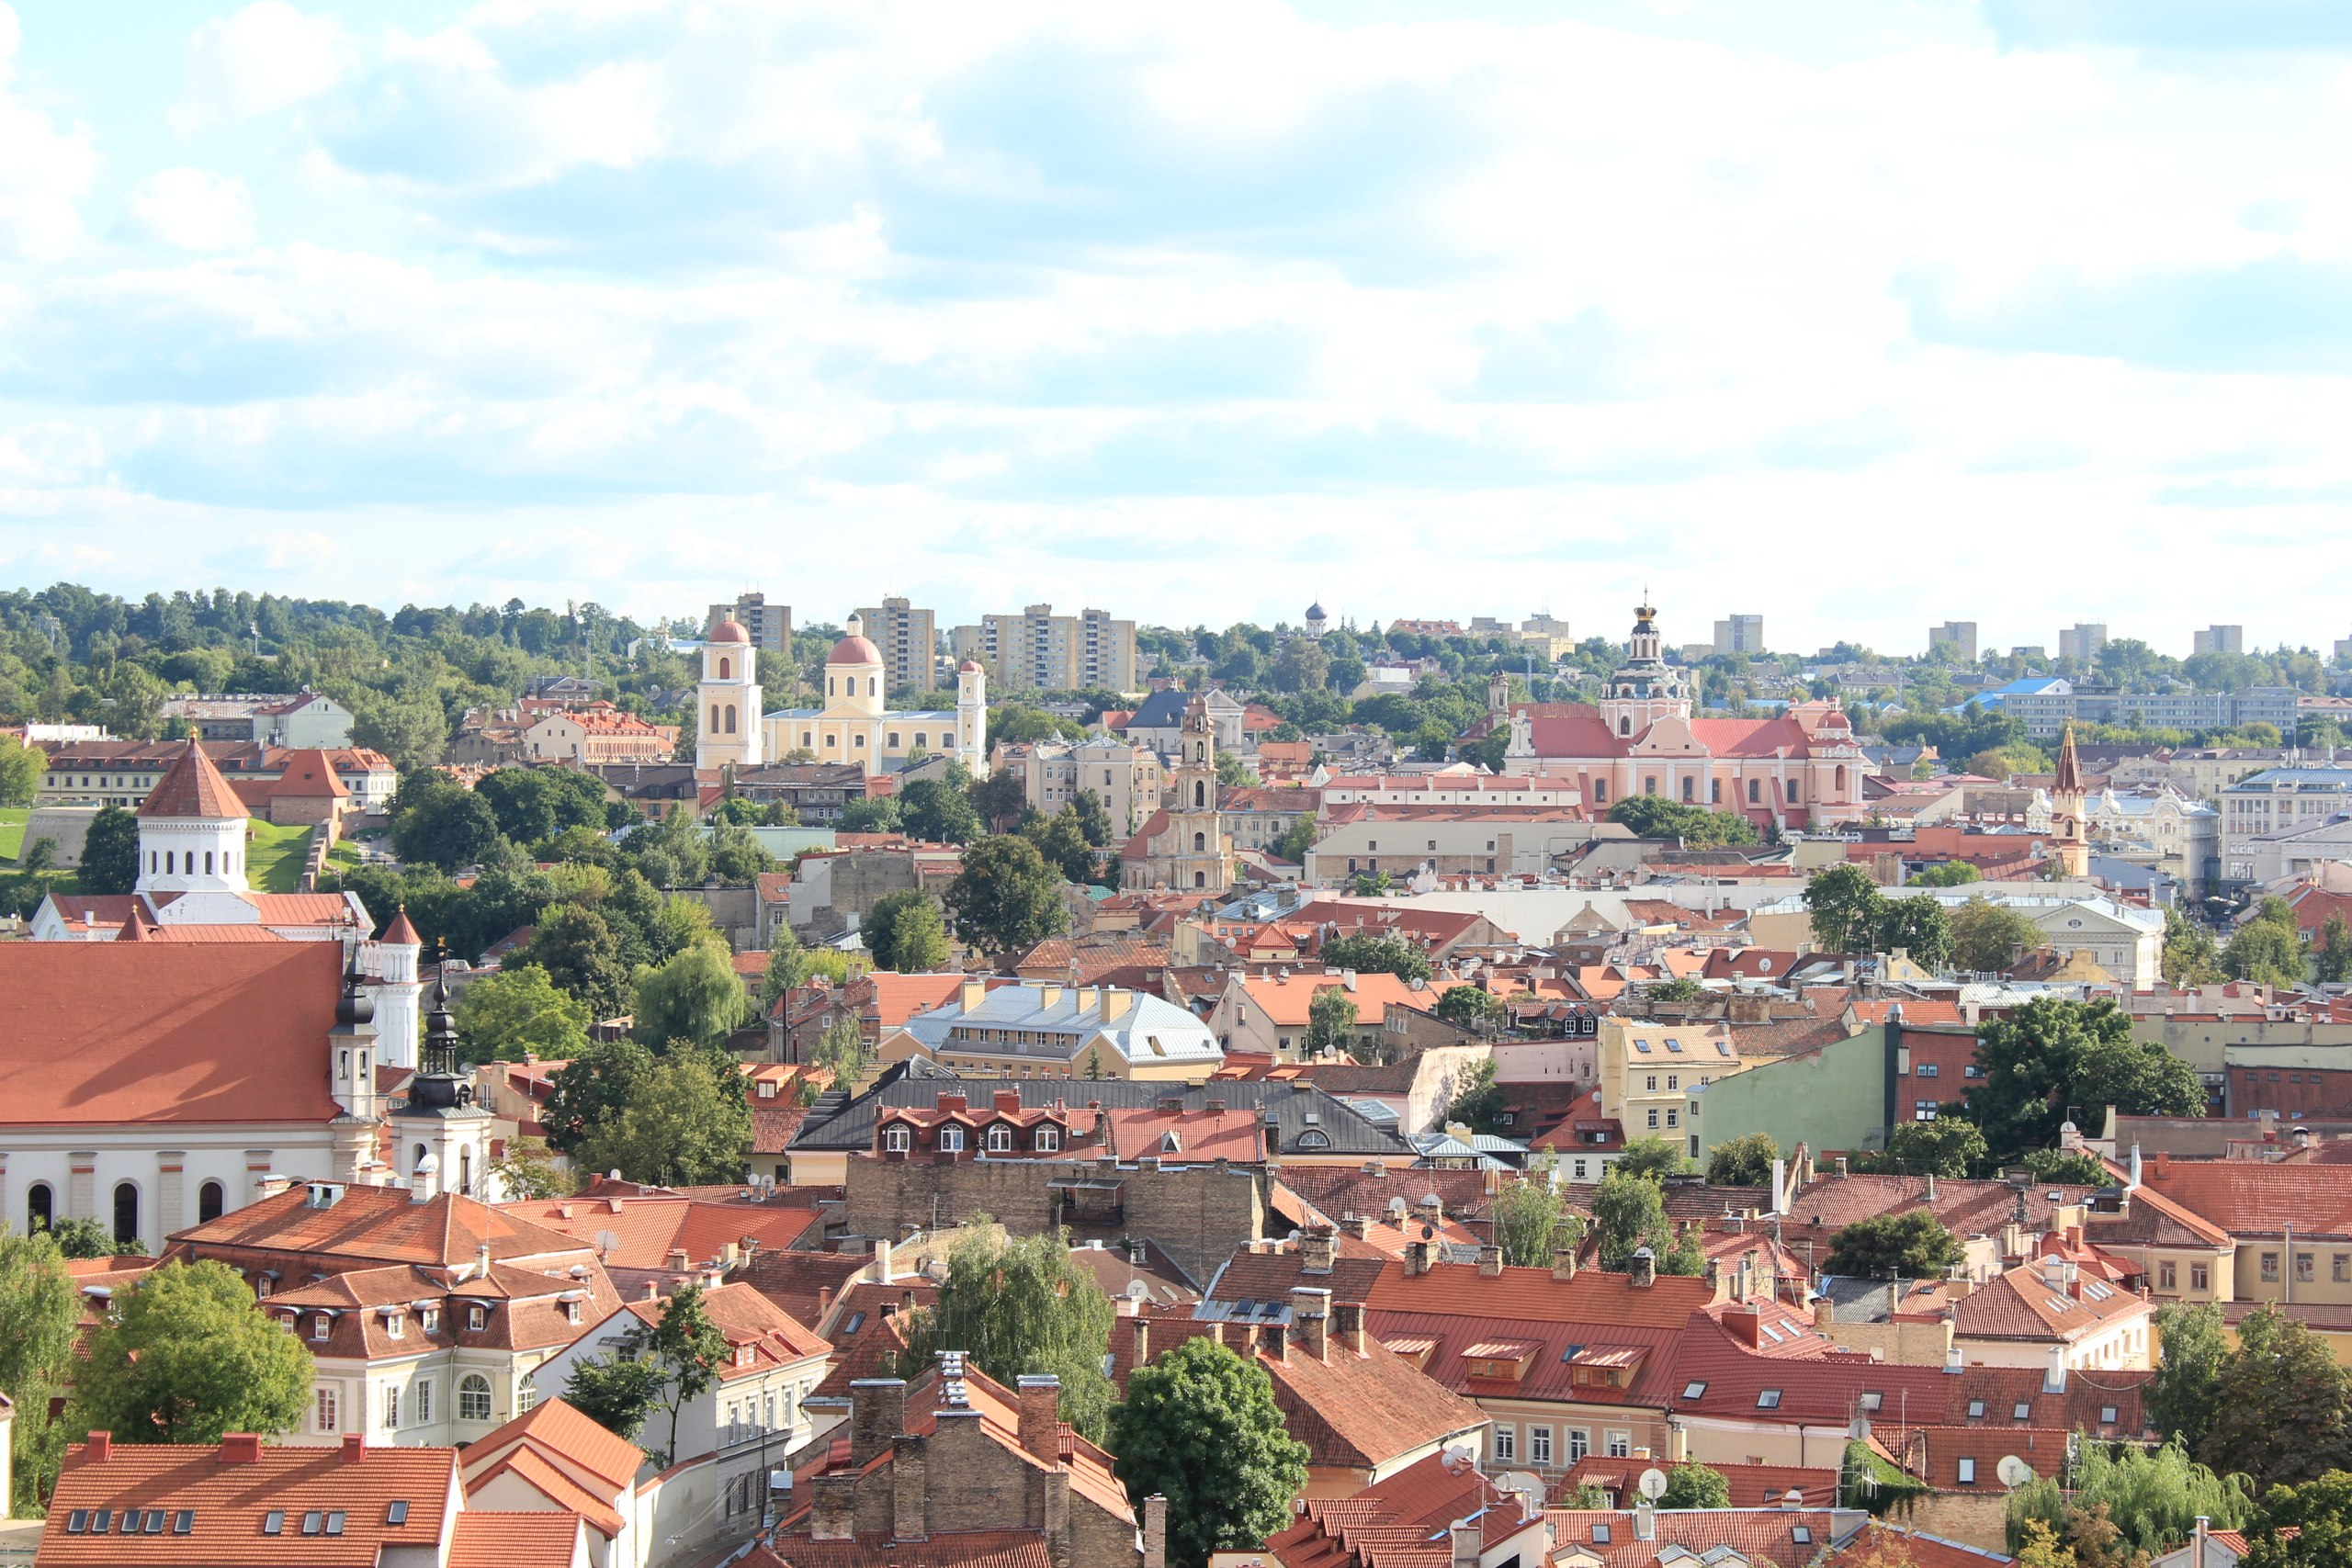 Европа. Вильнюс, вид на старый город